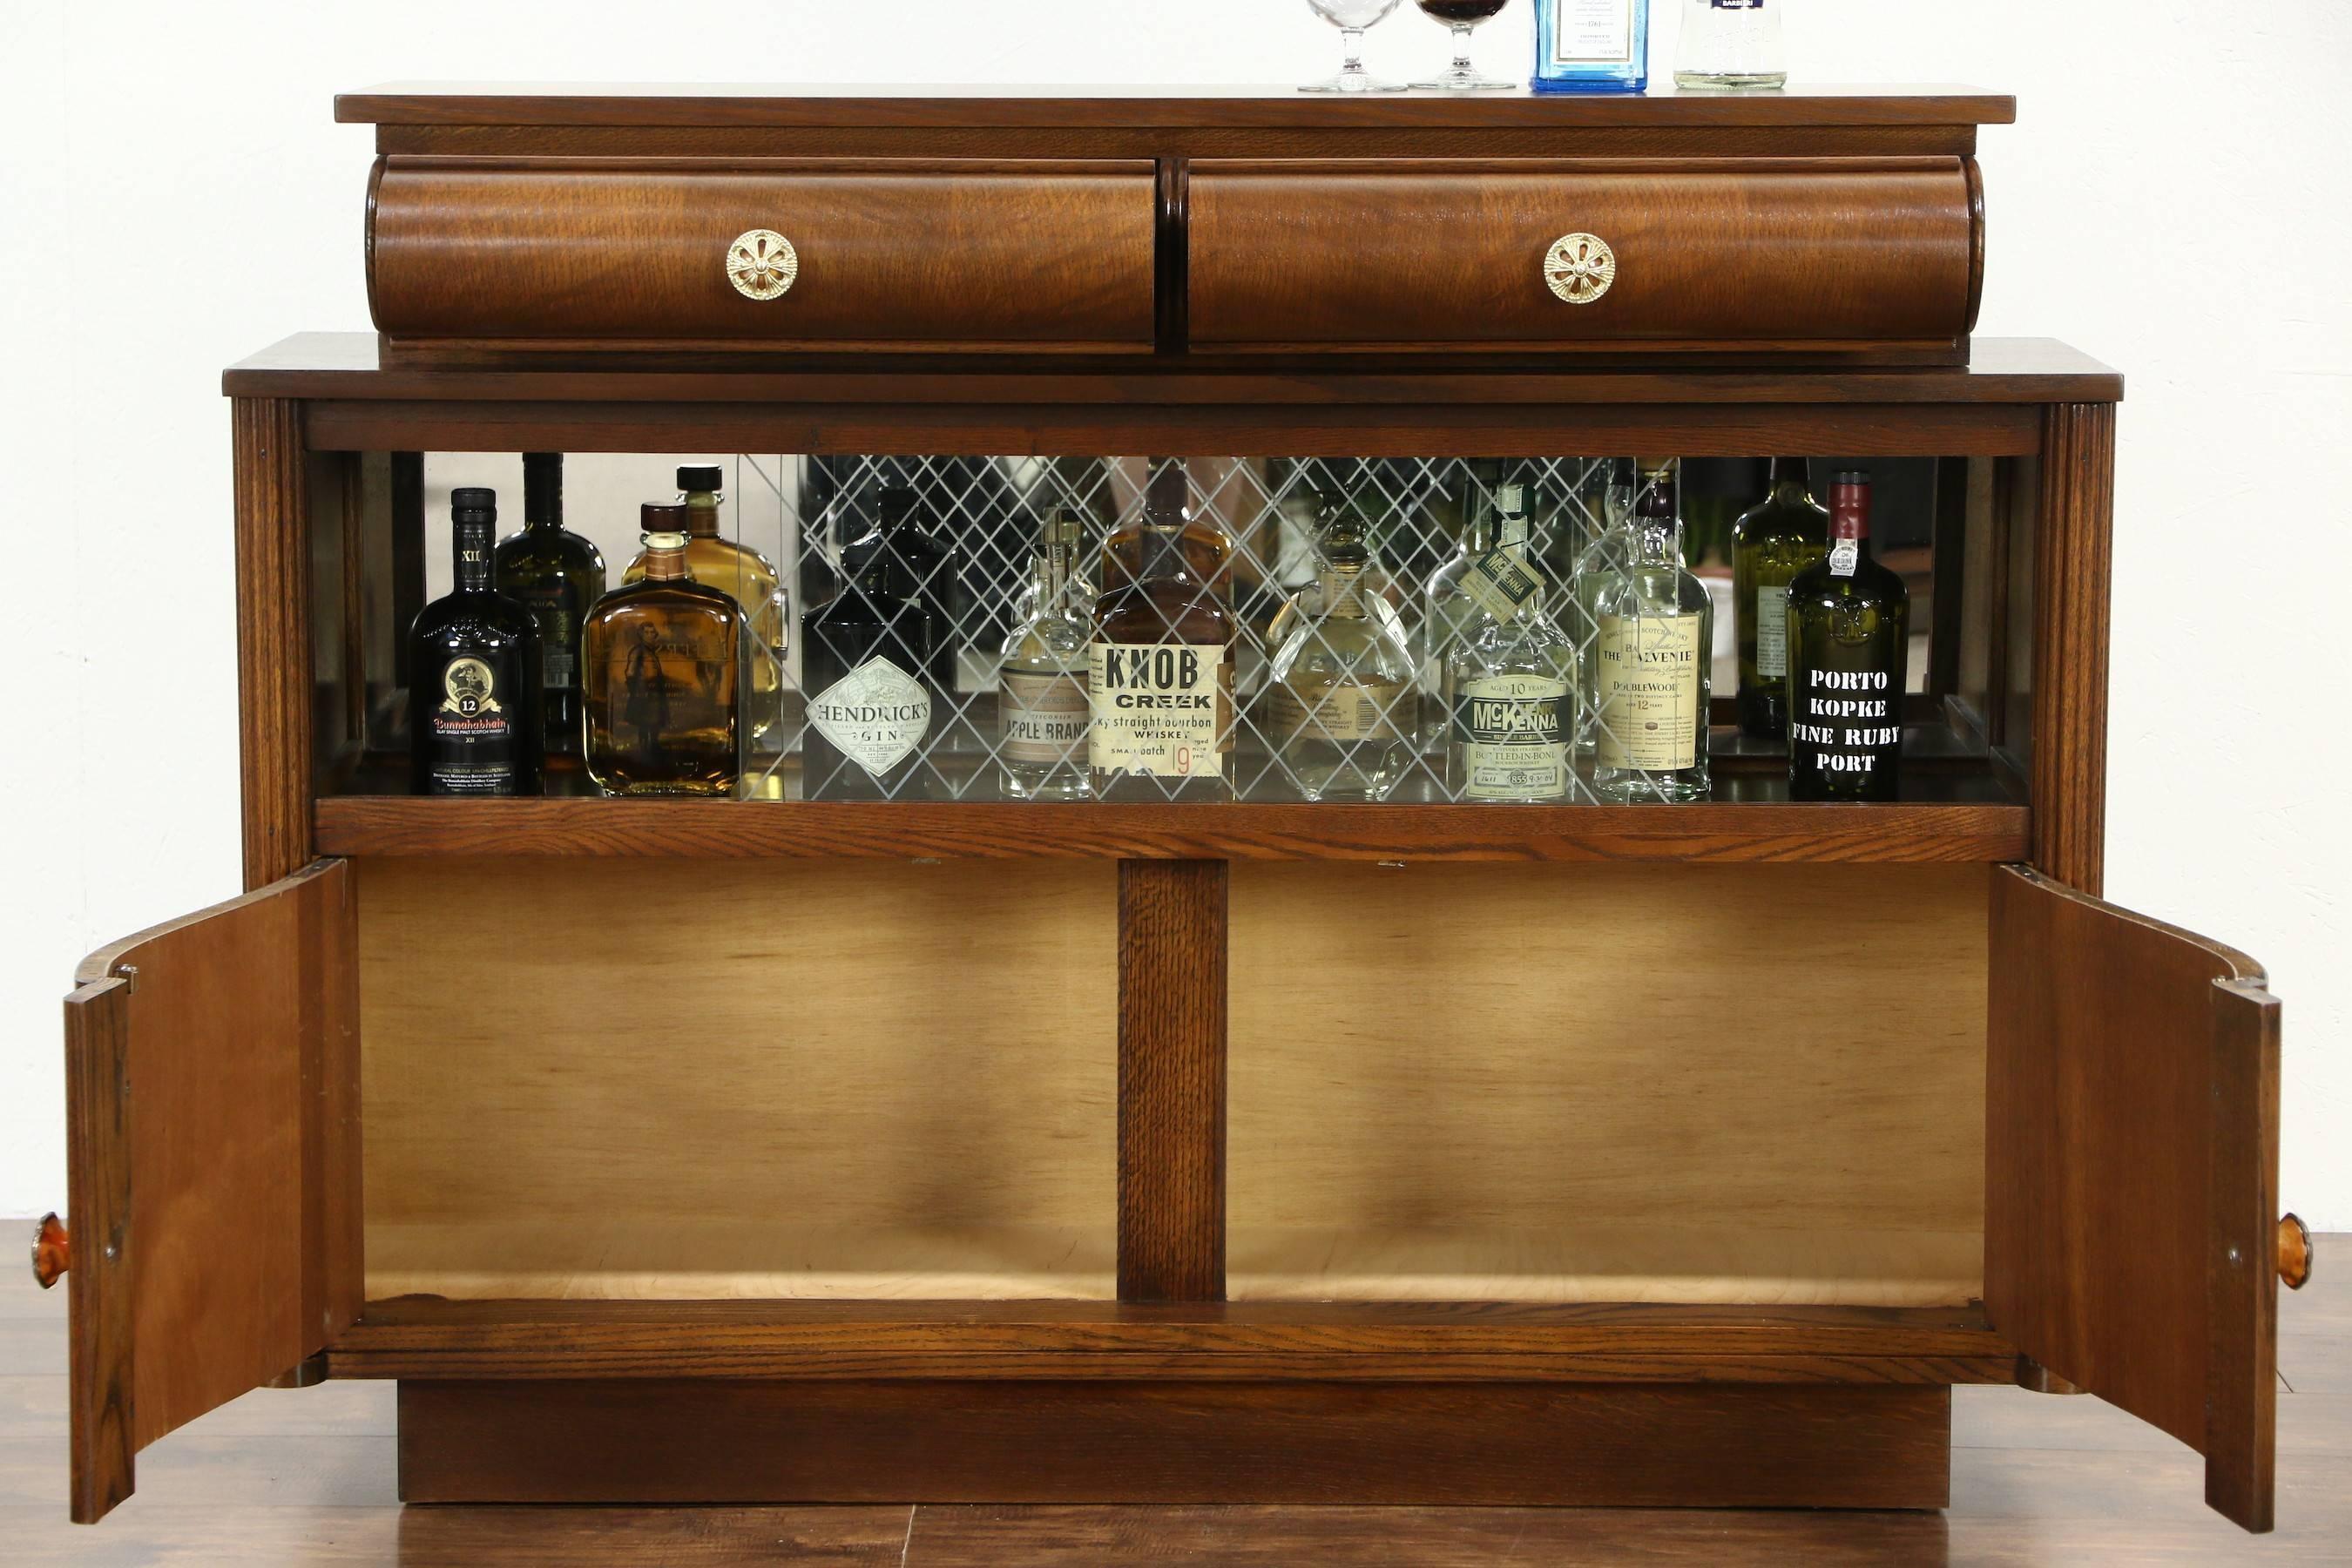 Sold – Art Deco Oak Vintage Scandinavian Sideboard, Bar Cabinet Inside Most Up To Date Sideboard Bar Cabinet (View 3 of 15)